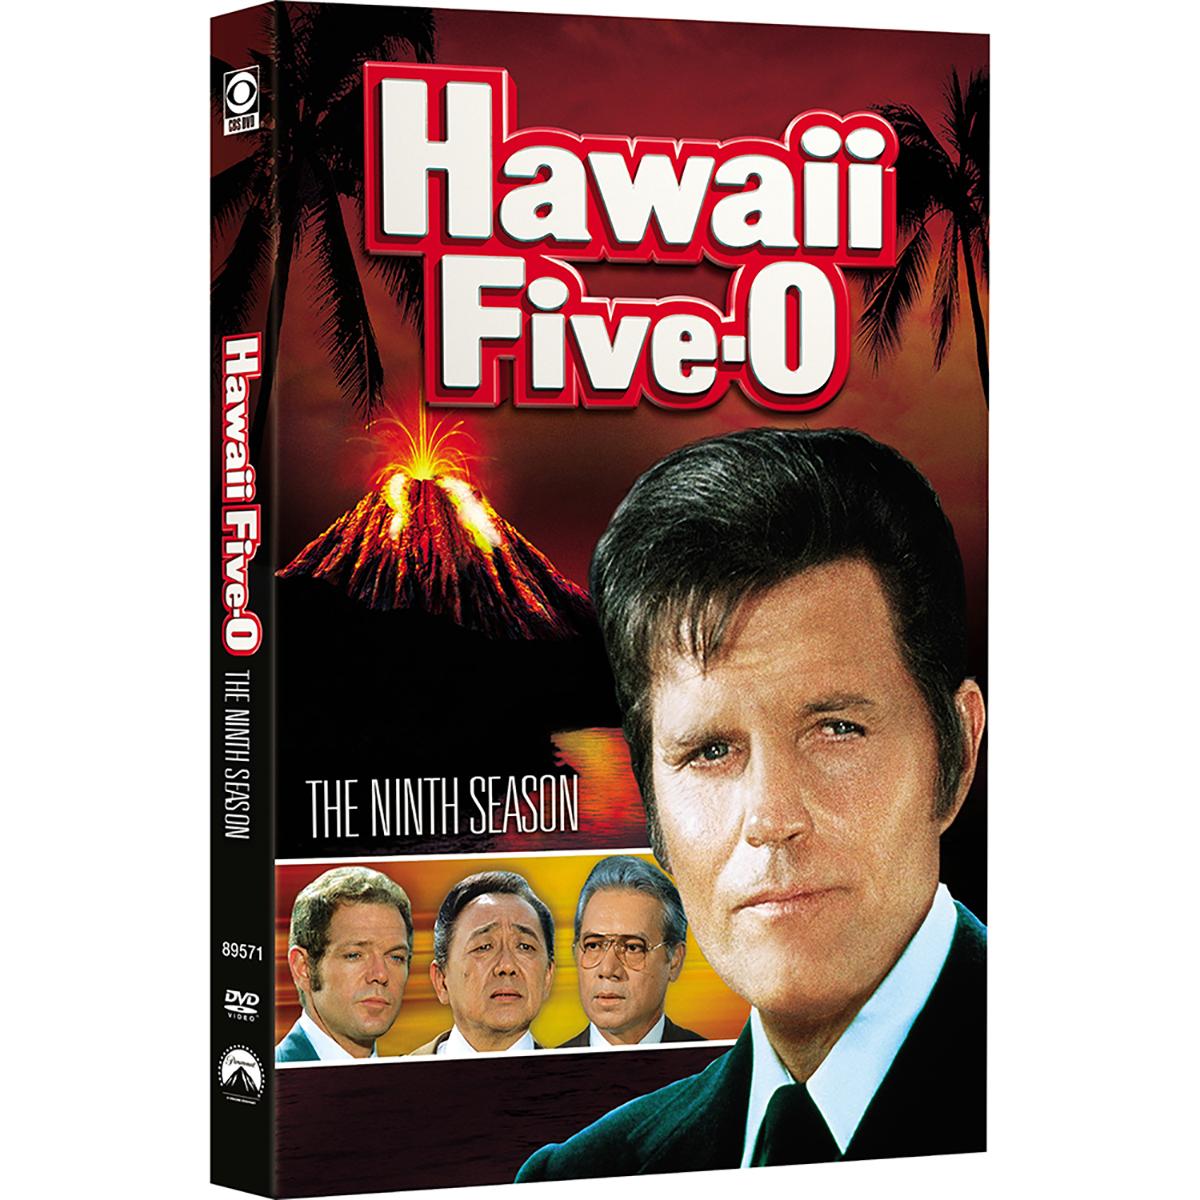 Hawaii Five-O: Season 9 DVD -  DVDs & Videos 2870-270745